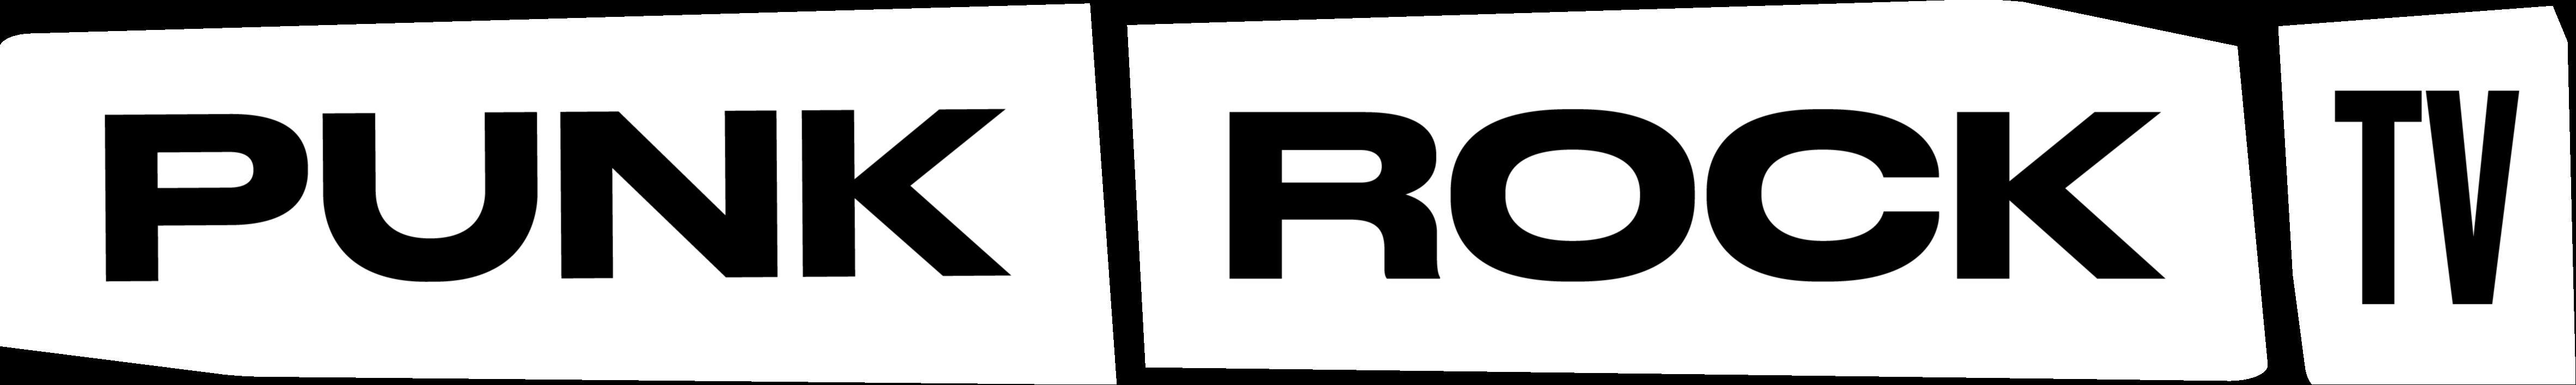 PUNK ROCK TV